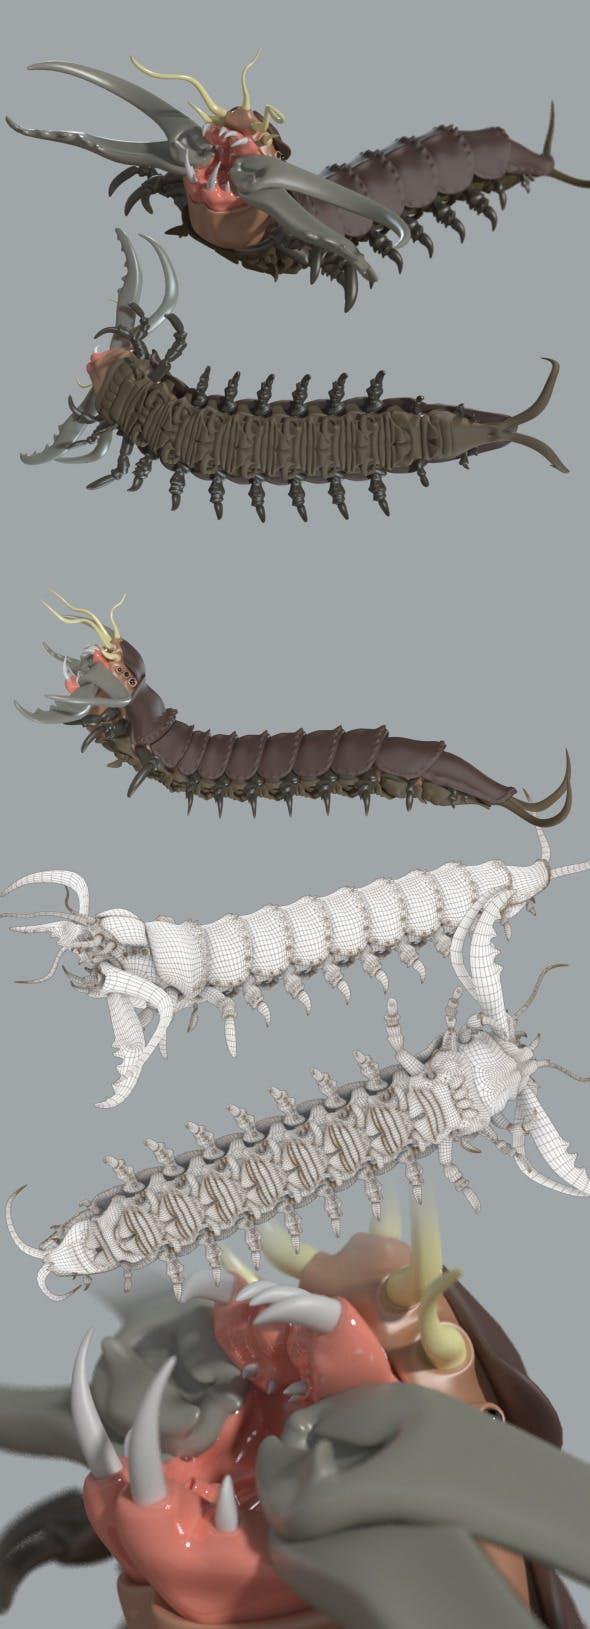 Bobbit worm - 3DOcean Item for Sale